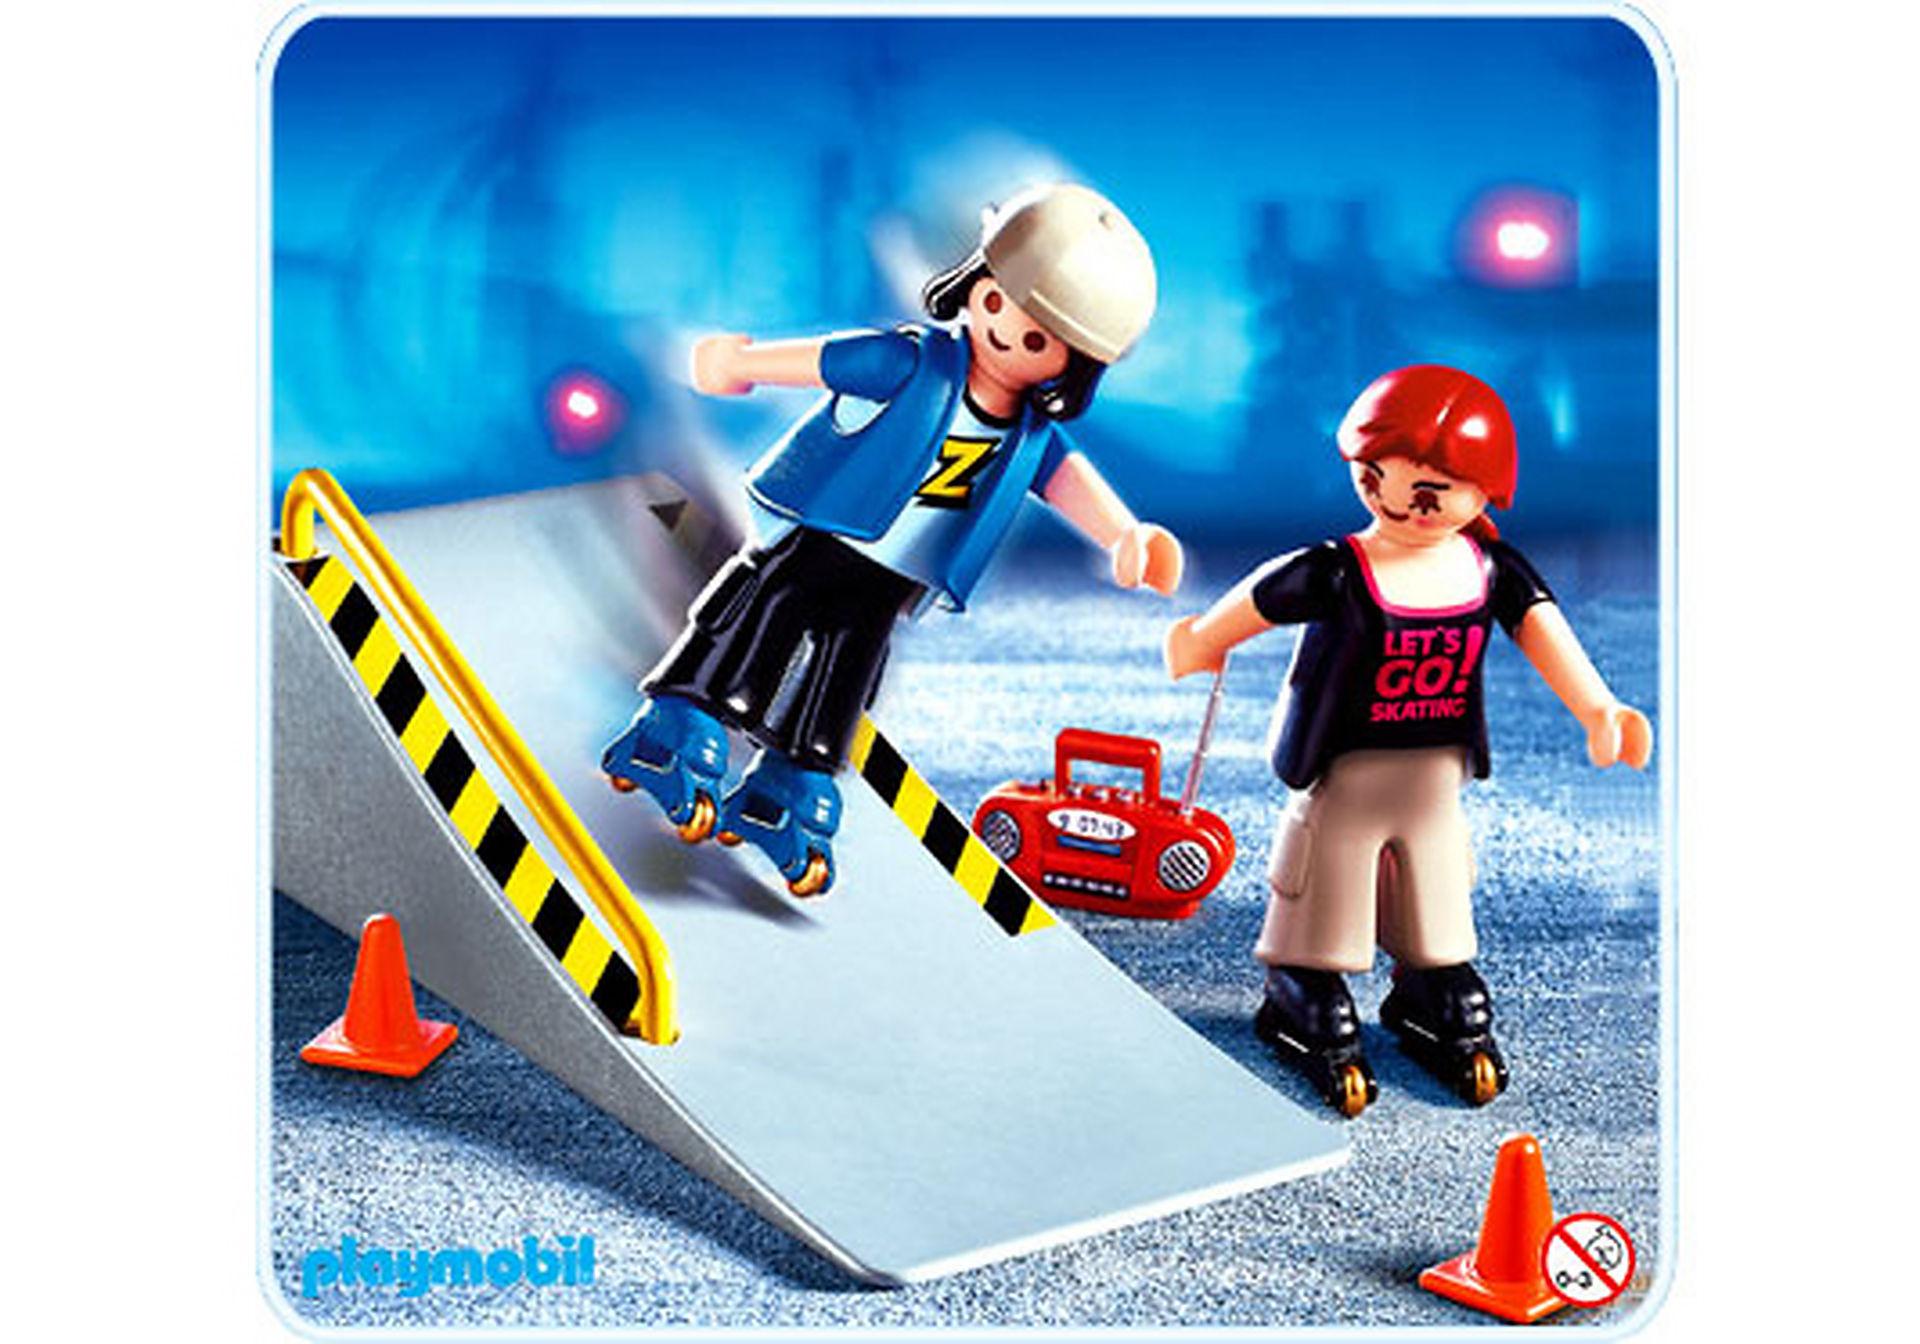 http://media.playmobil.com/i/playmobil/4415-A_product_detail/2 jeunes en rollers / tremplin